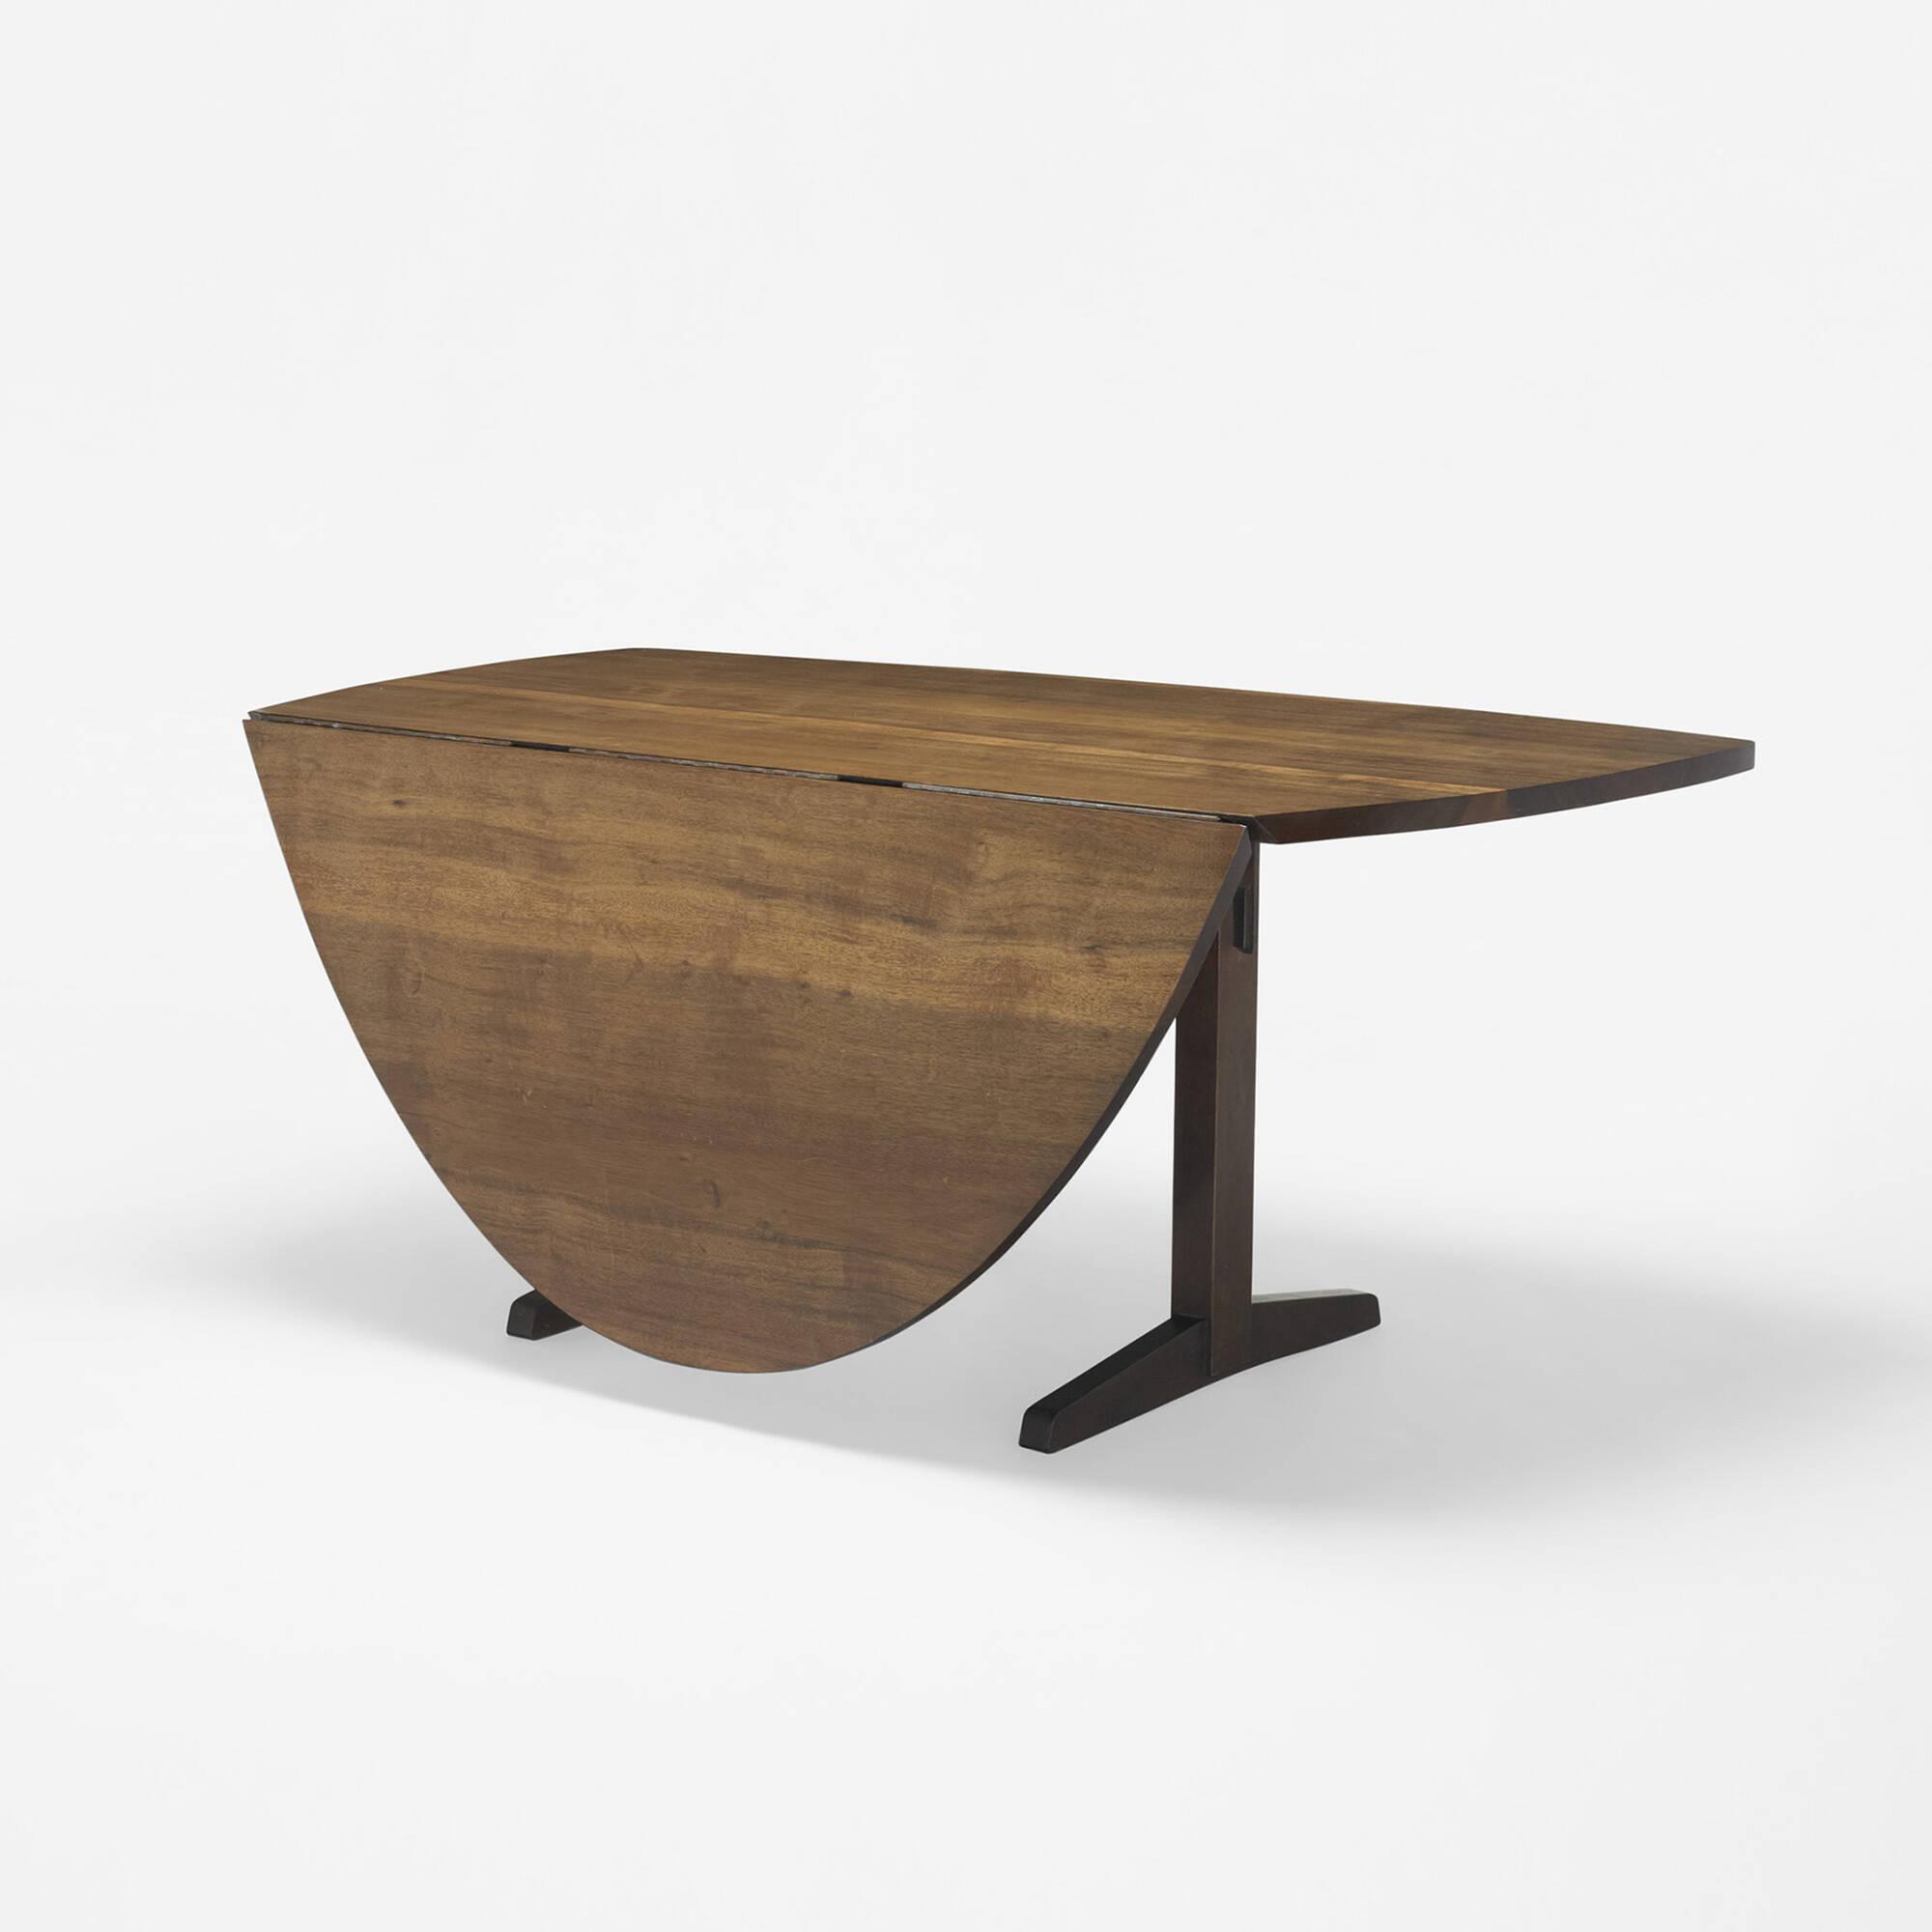 Modern Design 18 October 2012 Auctions